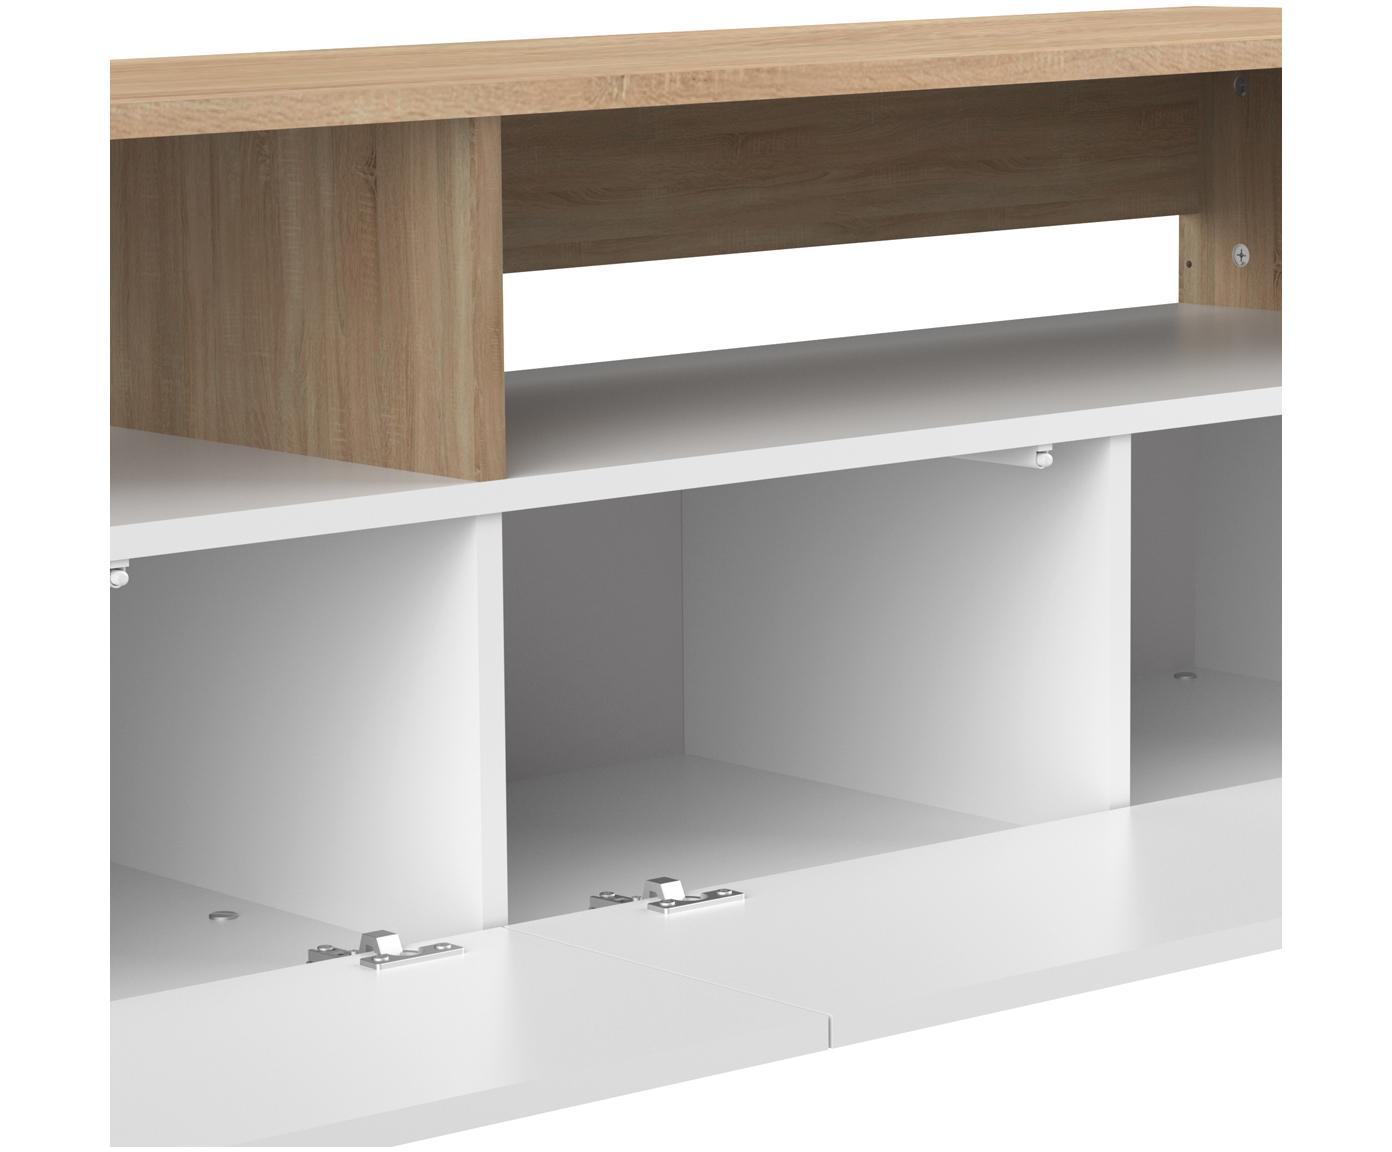 Tv-meubel Horizon, Frame: melamine gecoate spaanpla, Poten: gelakt massief beukenhout, Eikenhoutkleurig, wit, 180 x 61 cm